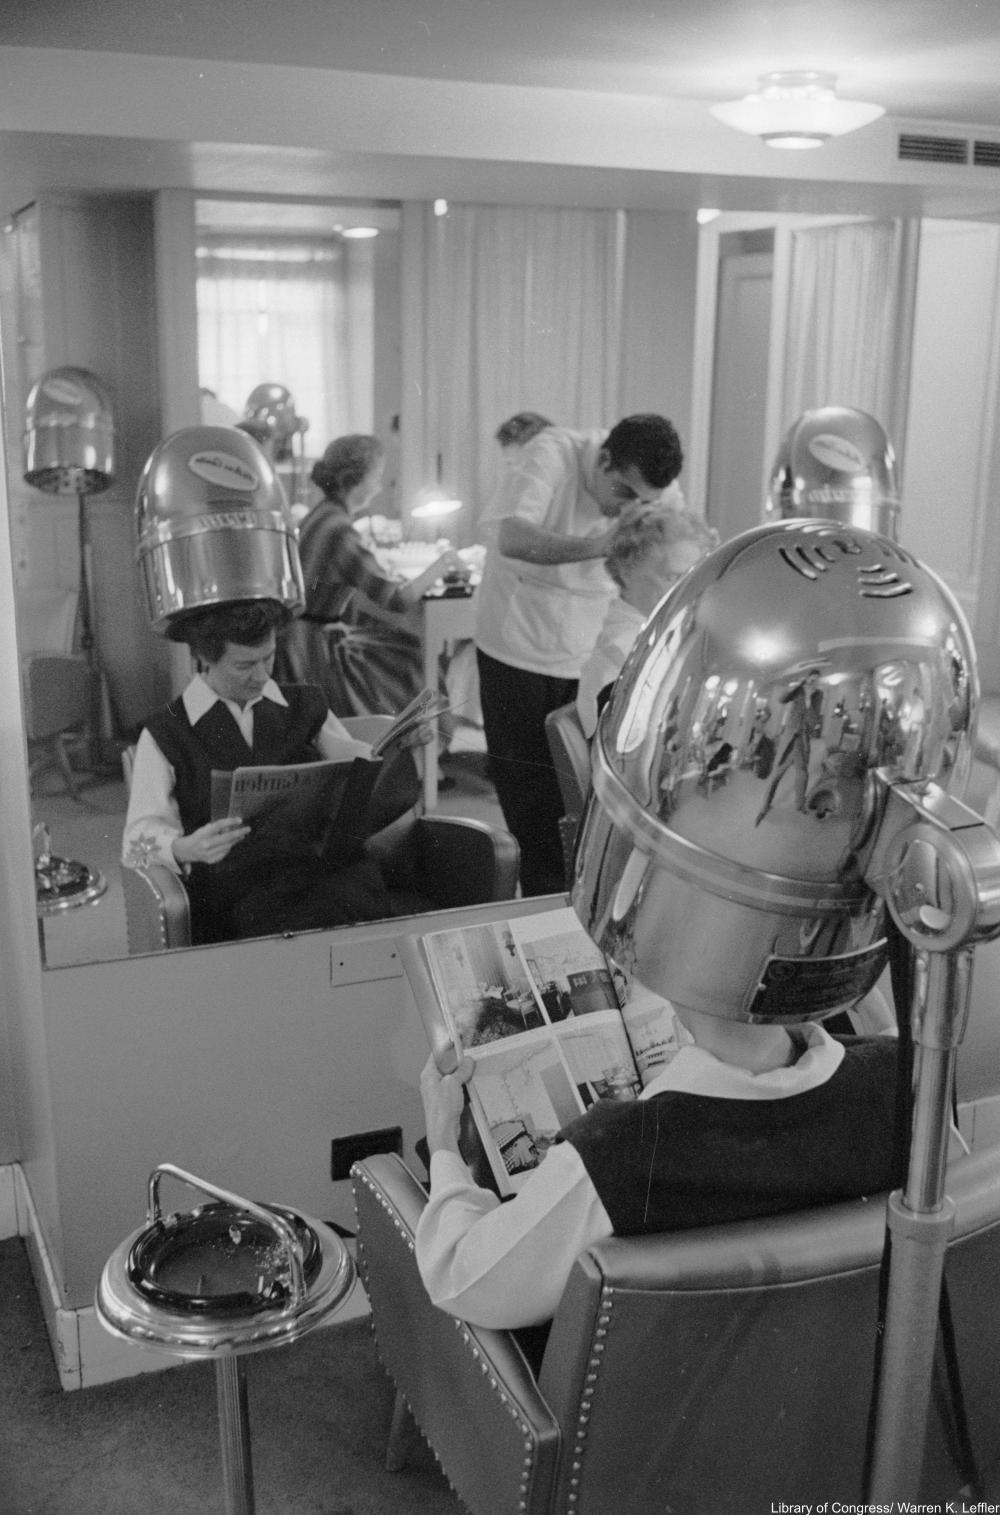 memories of the hair salon